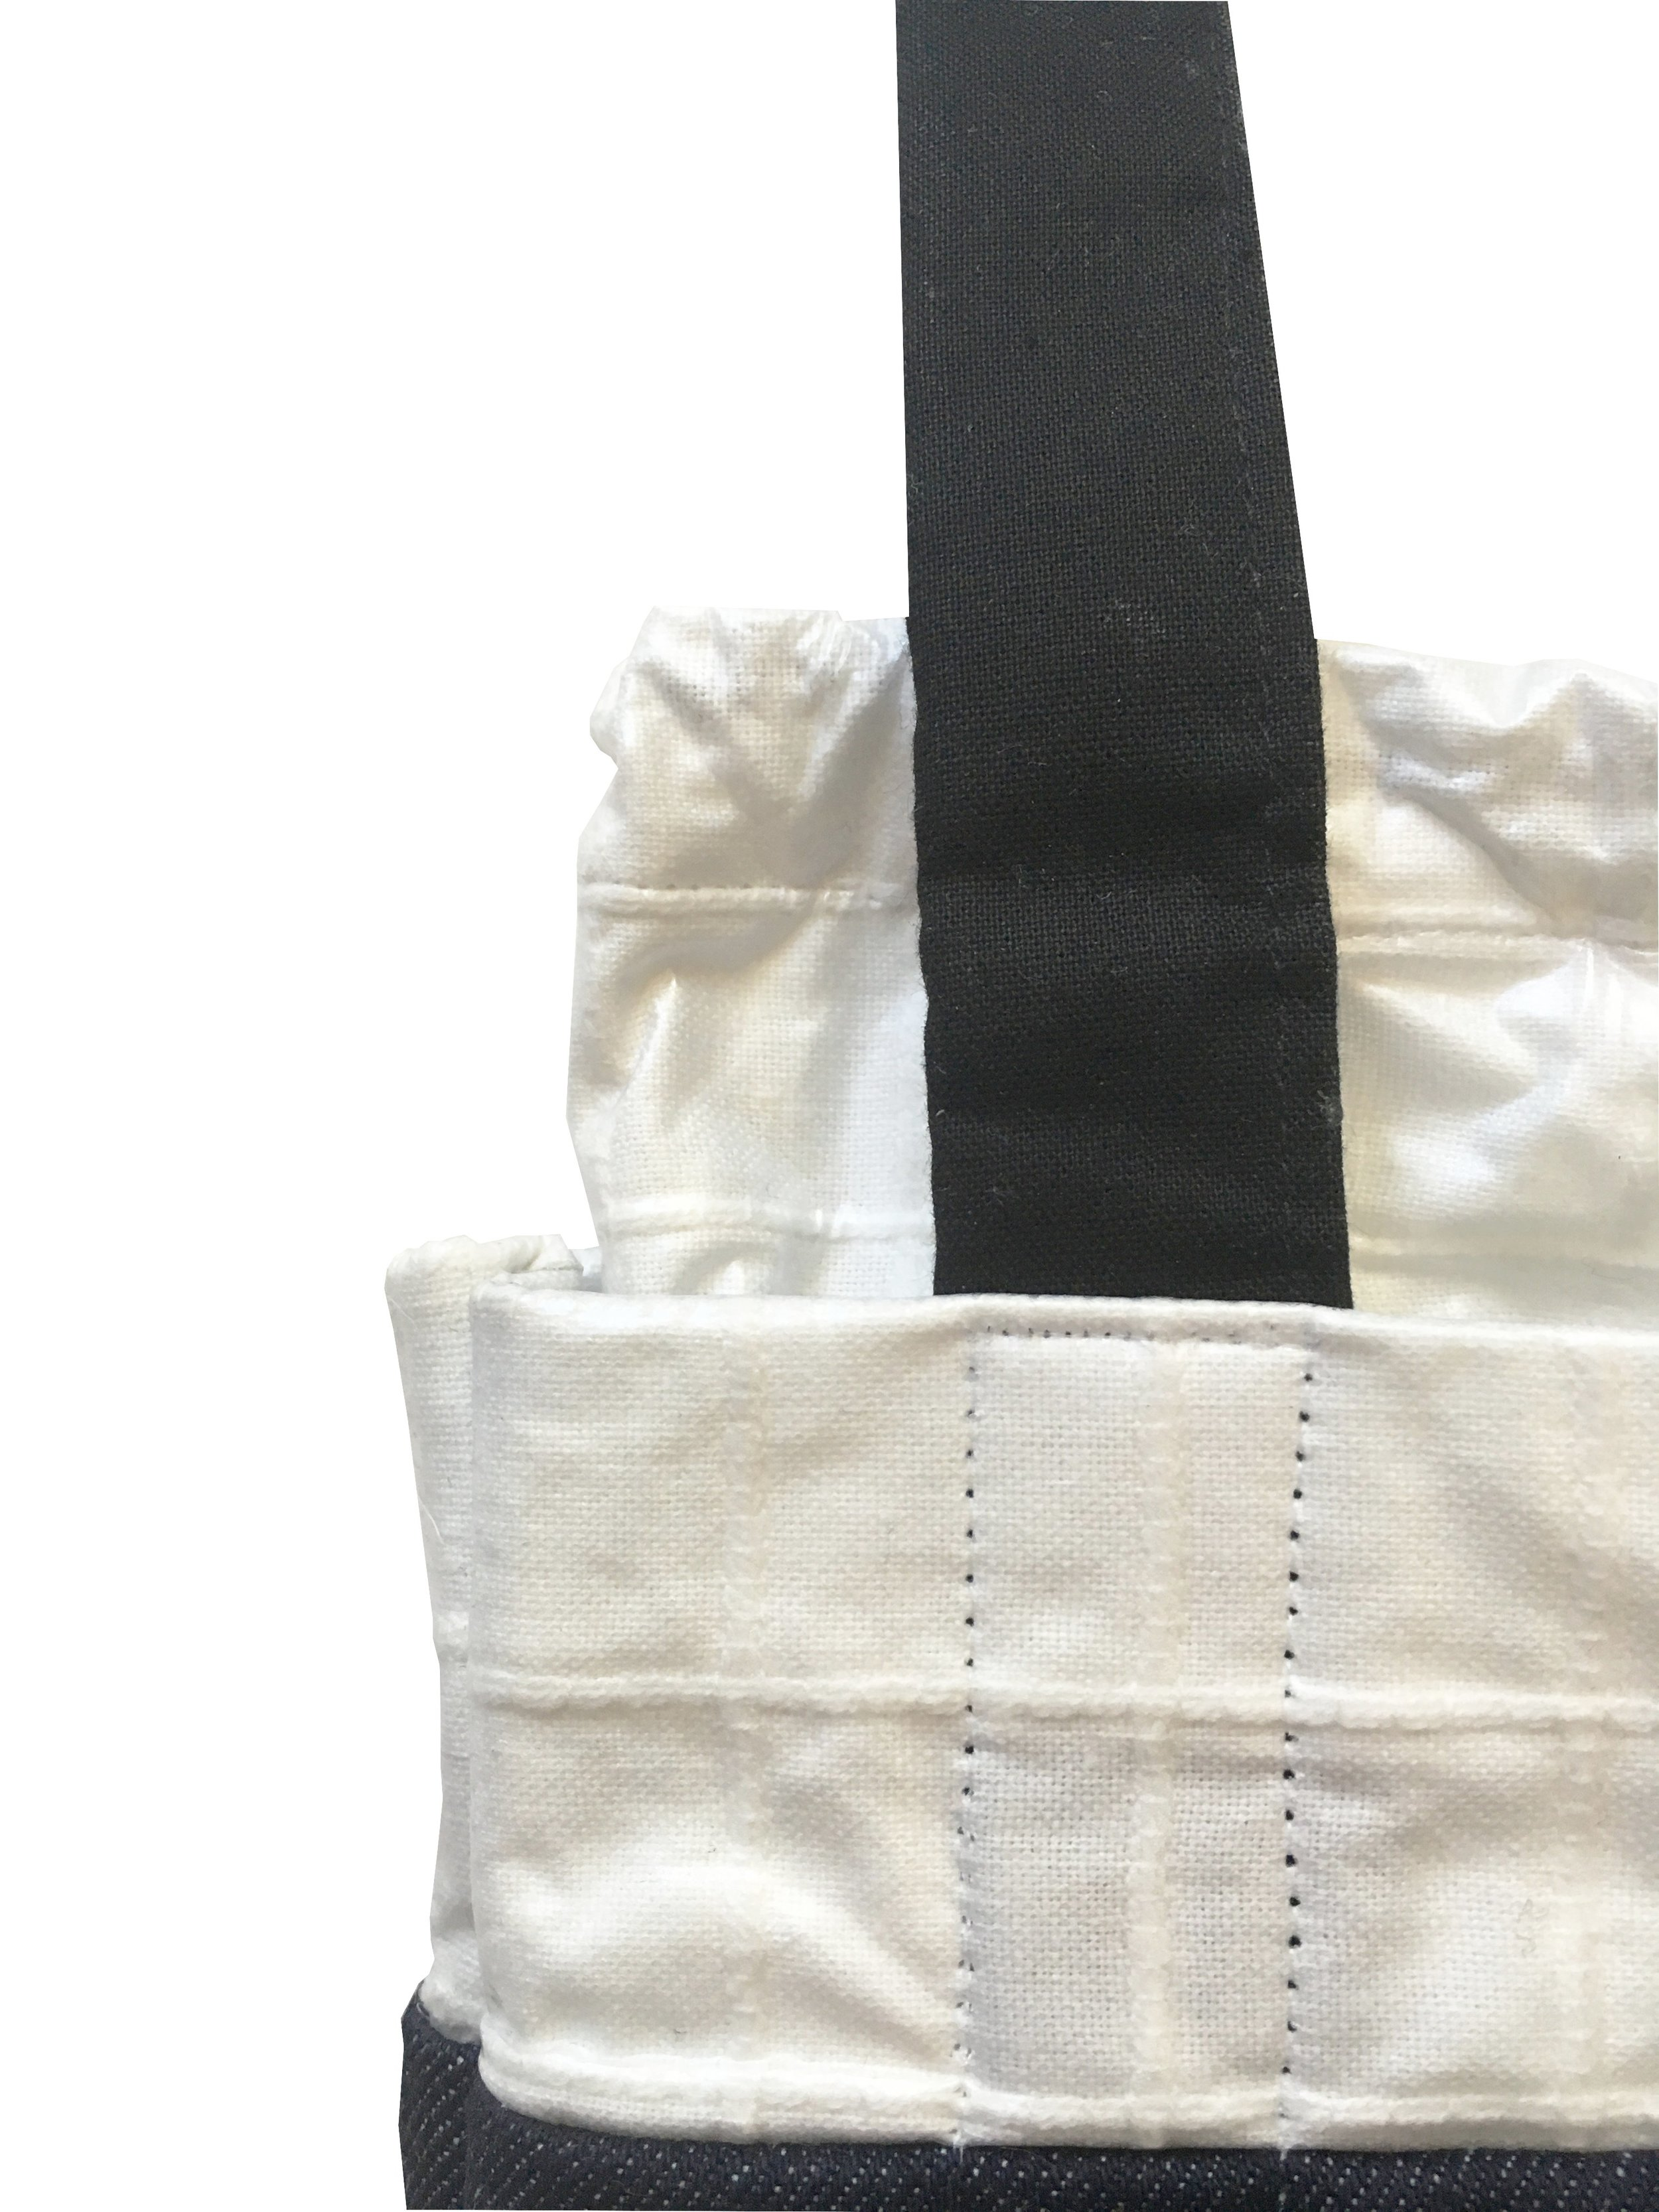 Backpack4(3).jpg